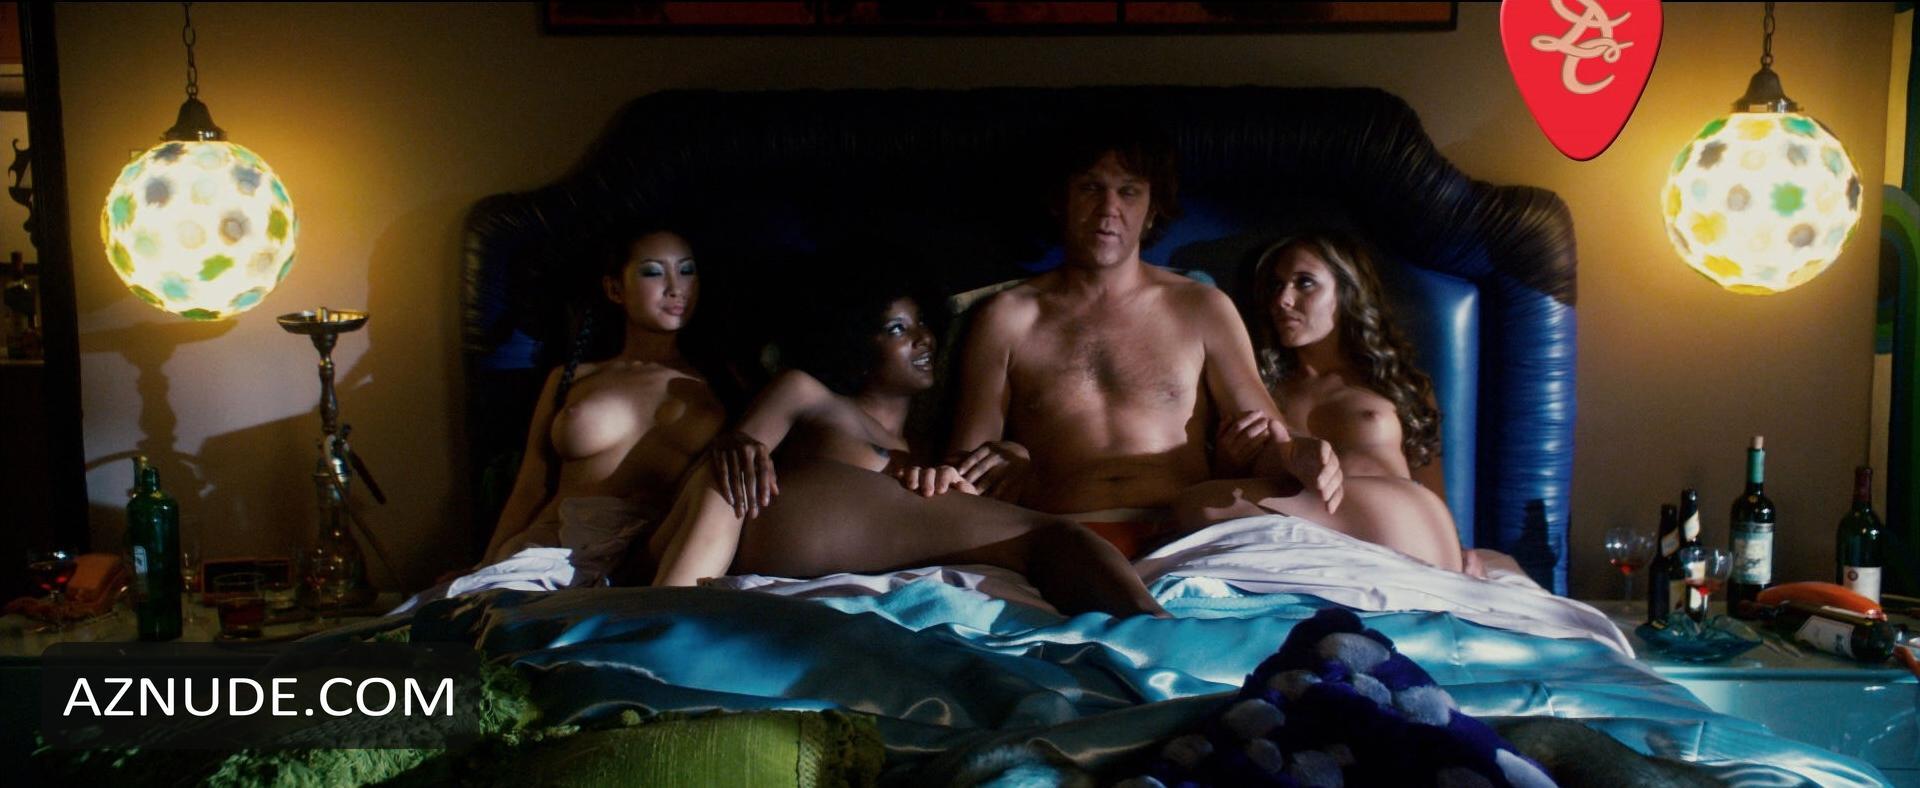 anal intim porno